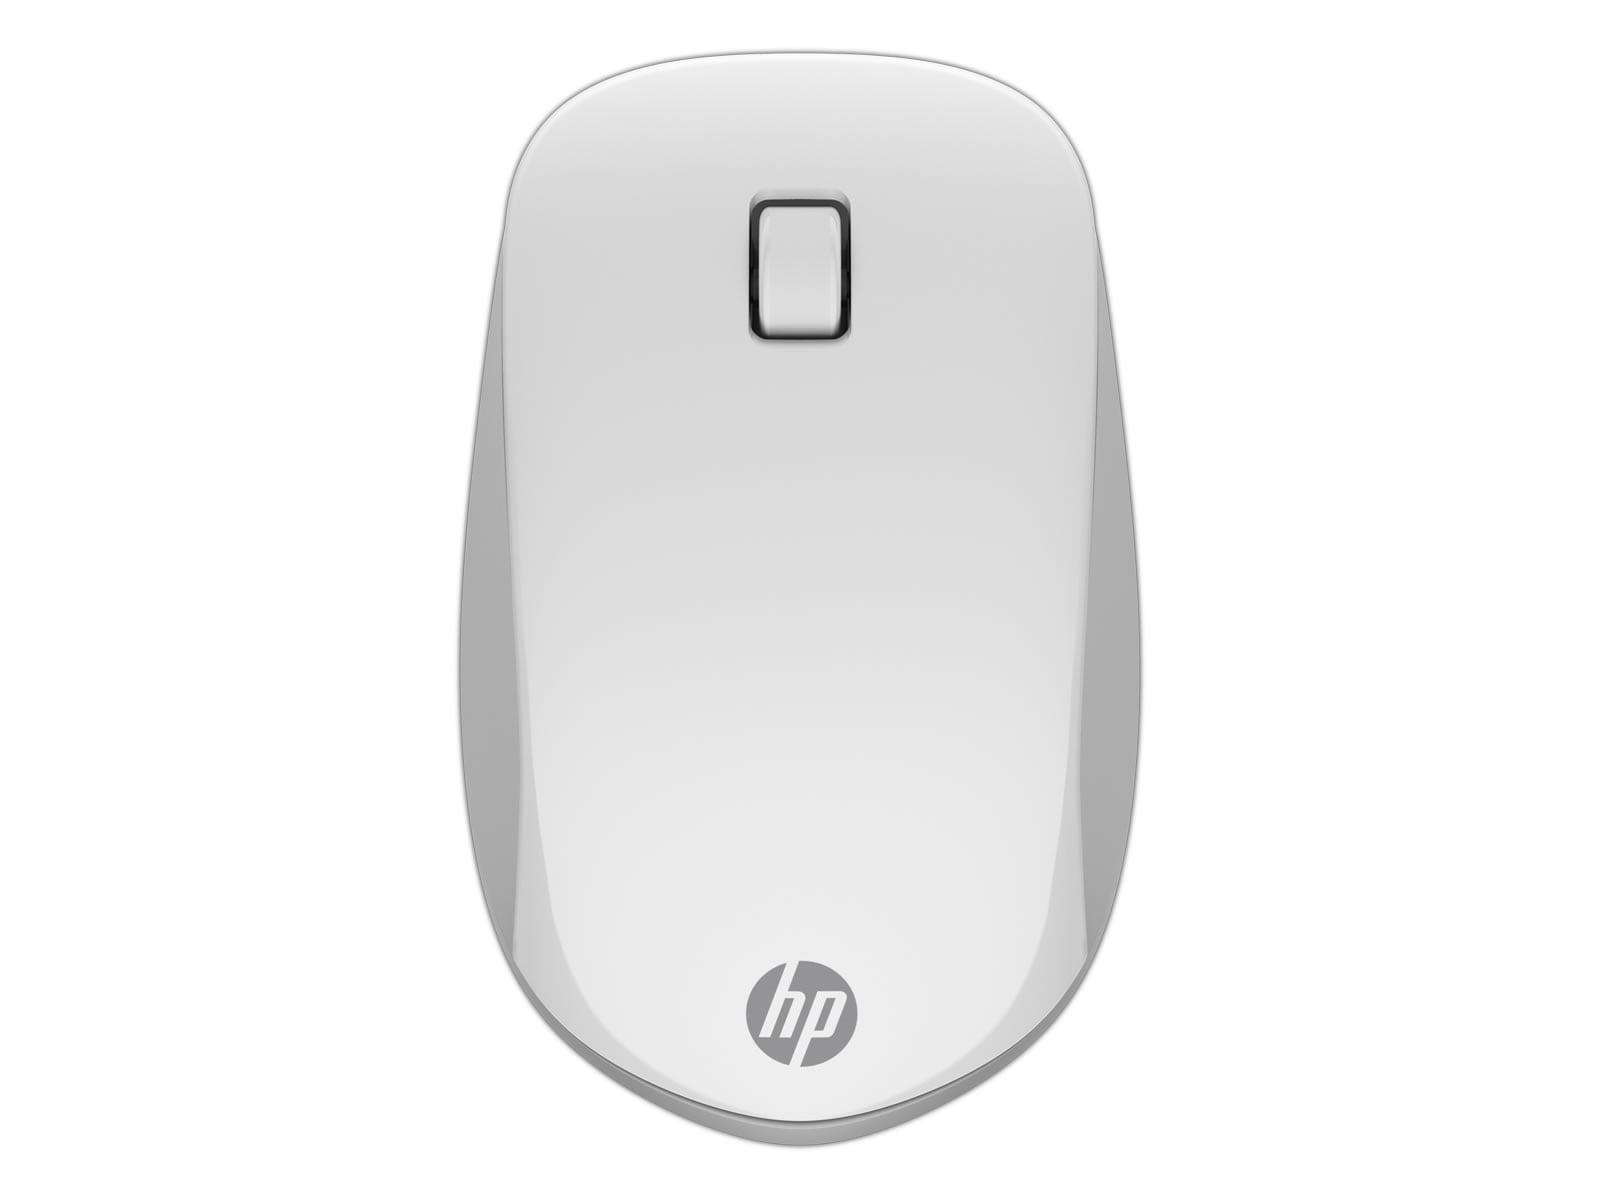 2022274-HP-Mouse-Bluetooth-Z5000-Wireless-Mouse-Z5000-New-Retail-Warran